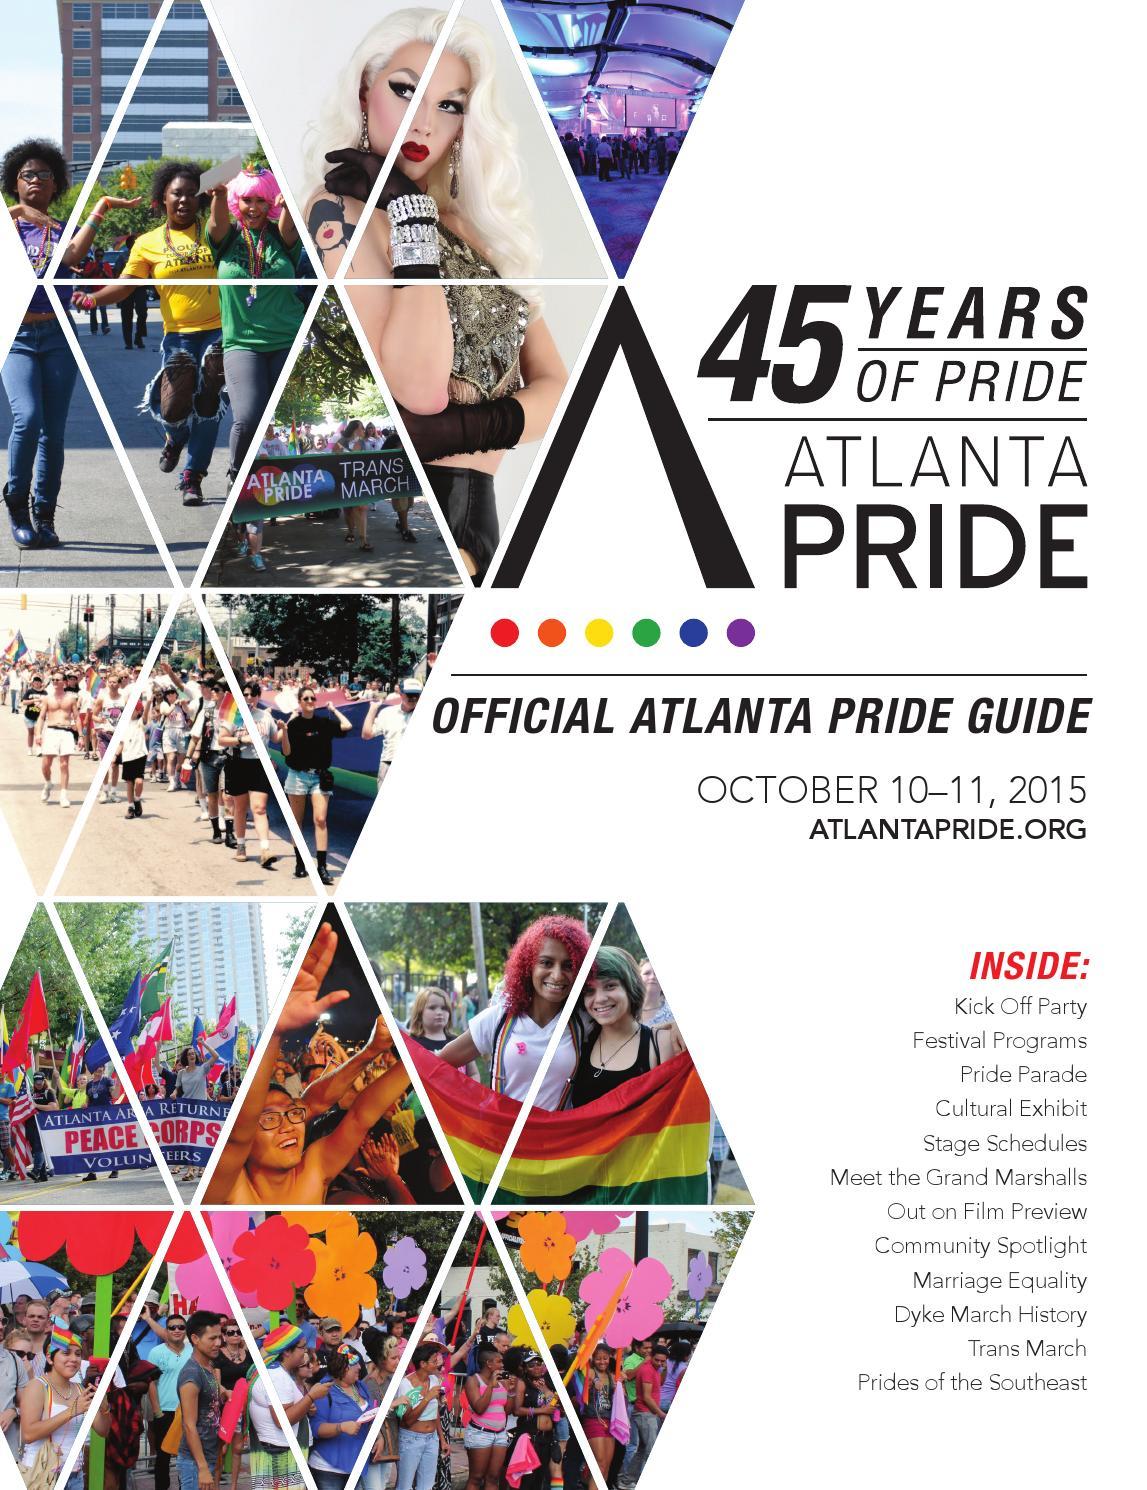 Atlanta speed dating companies that donate to 501c3